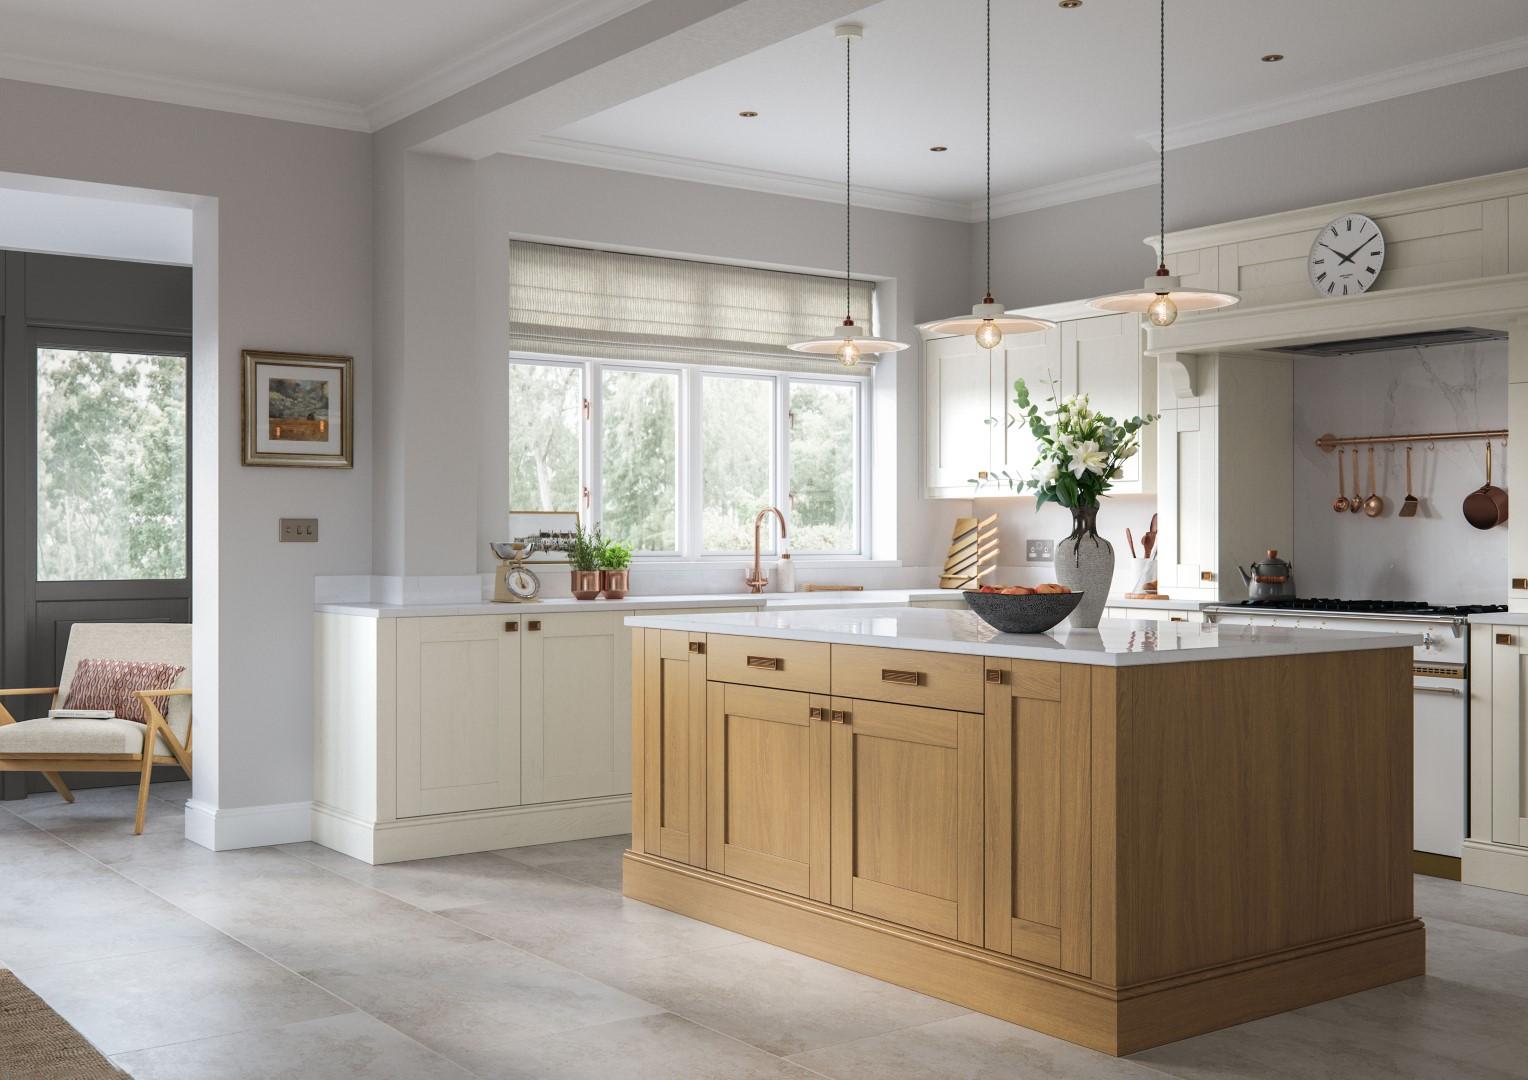 Madison Light Oak and Ivory - Kitchen Design - Alan Kelly Kitchens - Waterford - 1